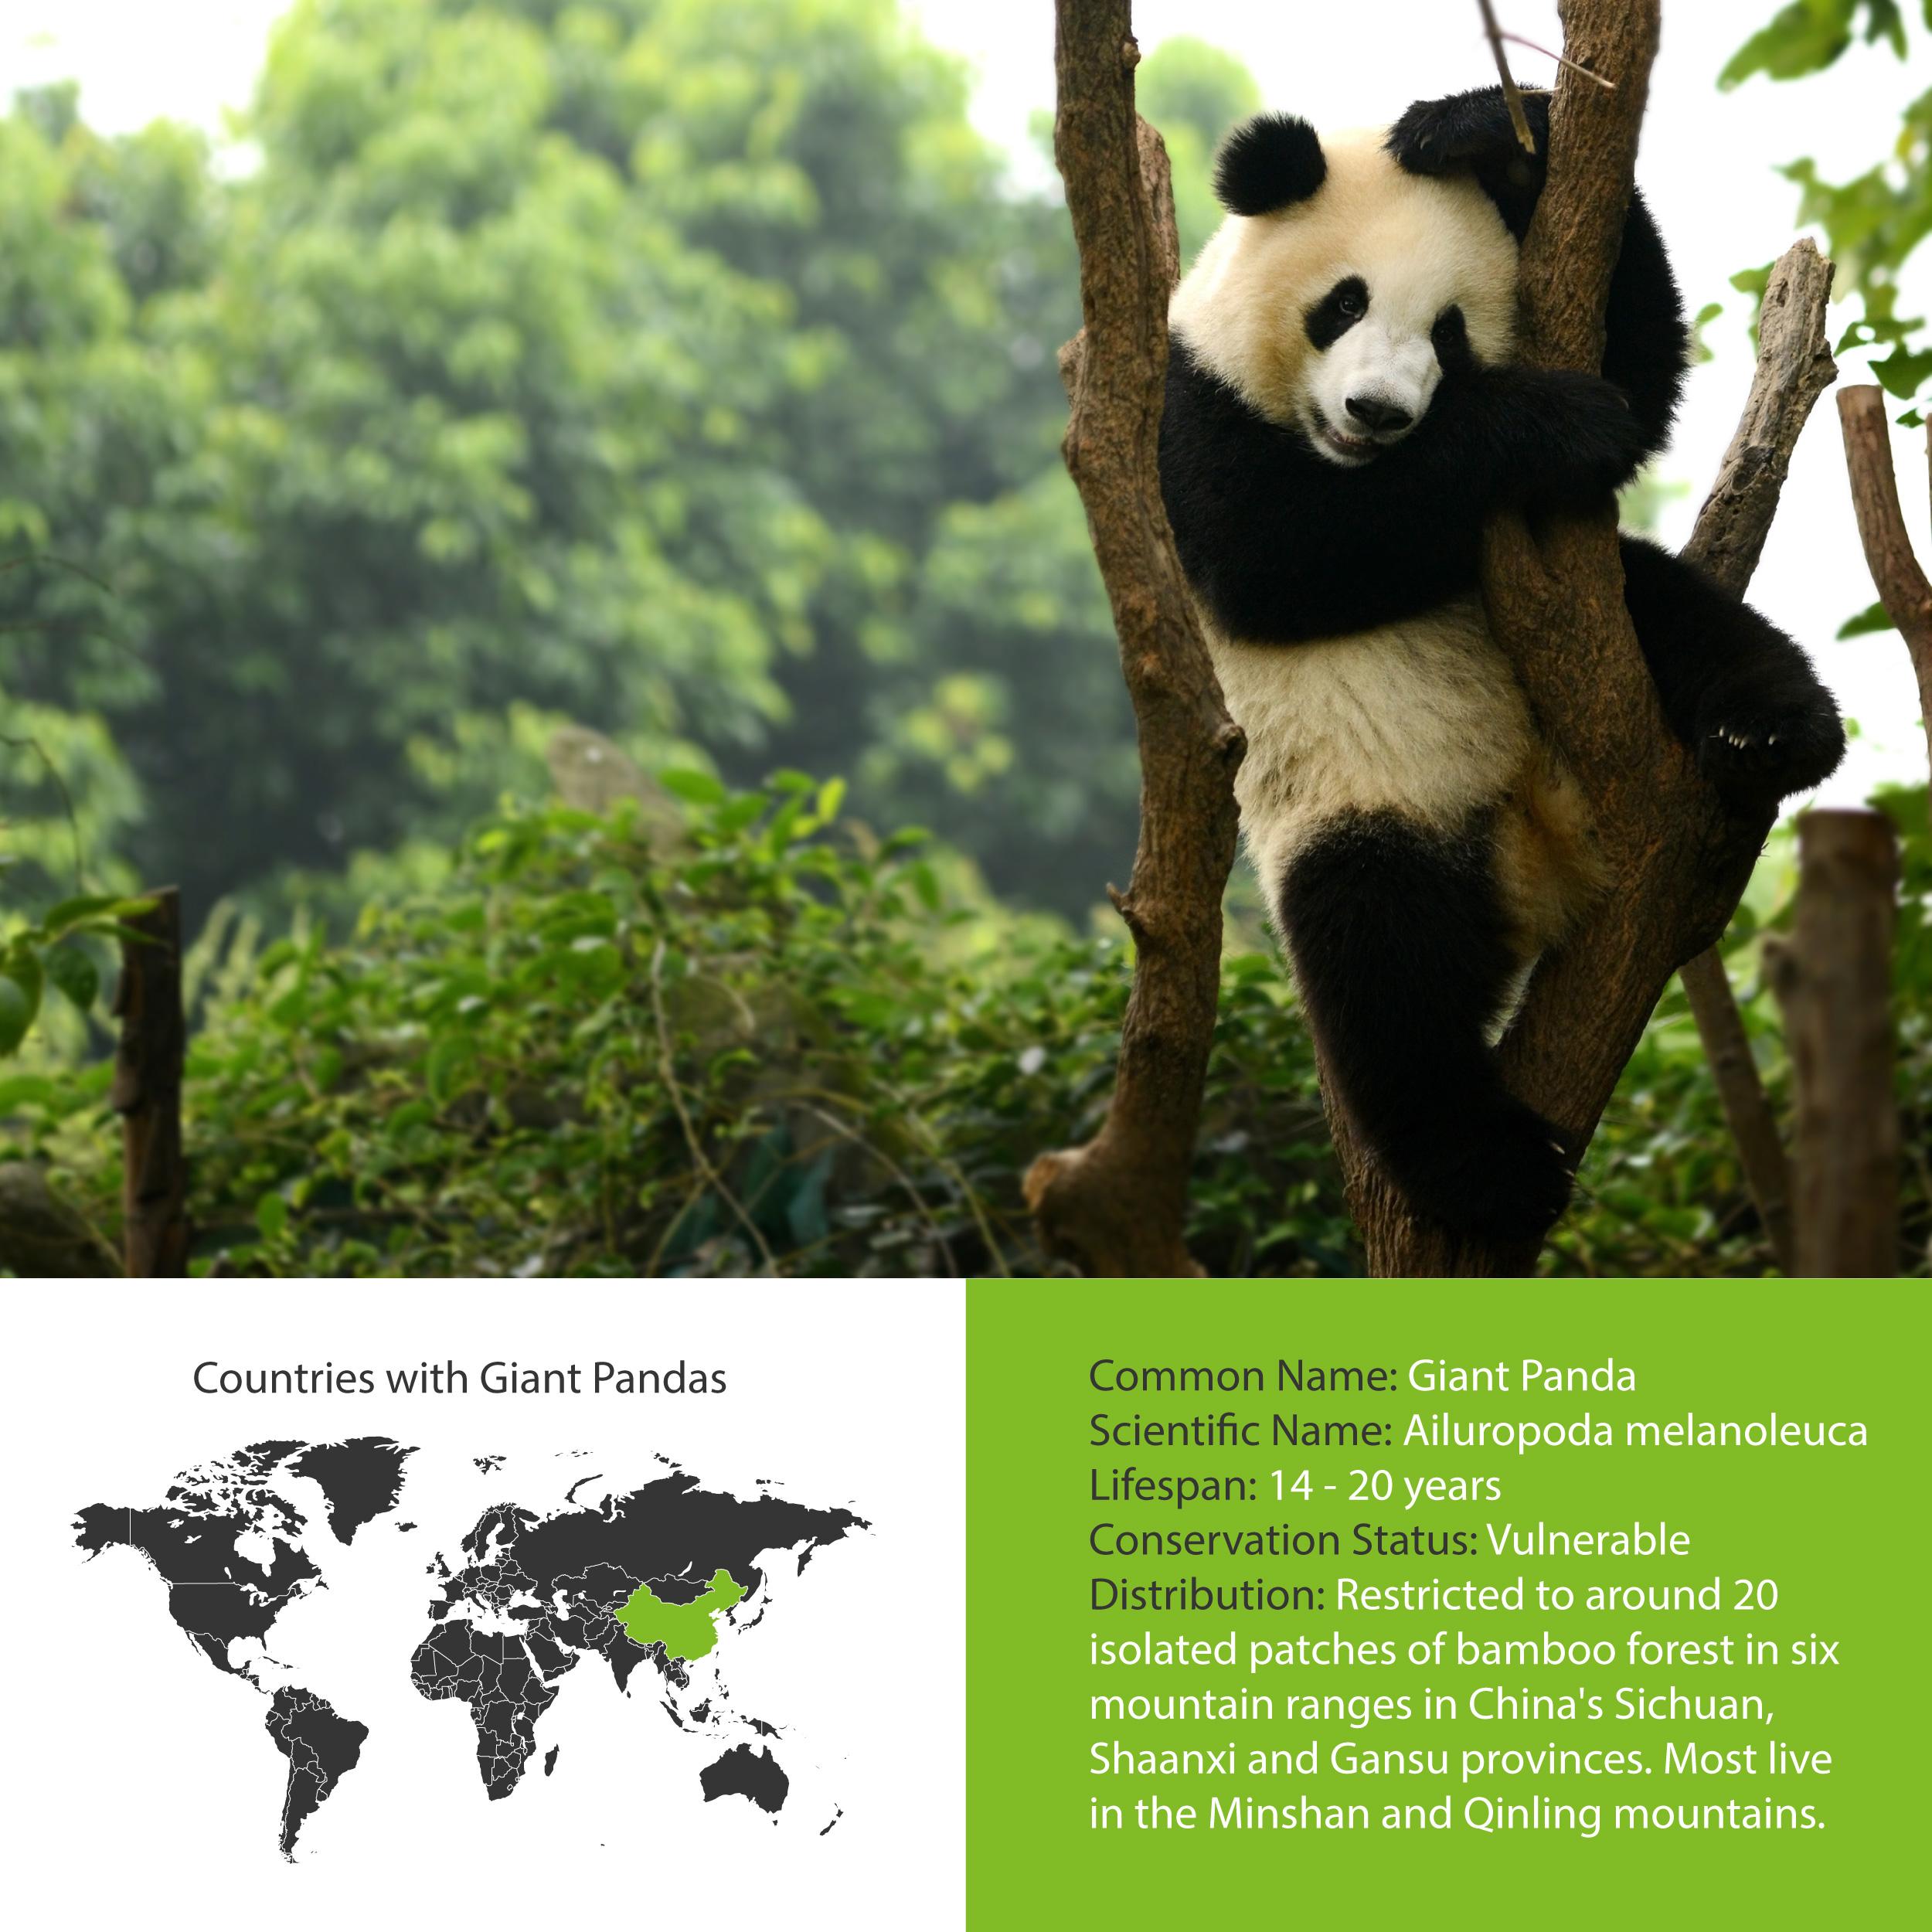 Giant Panda Distribution